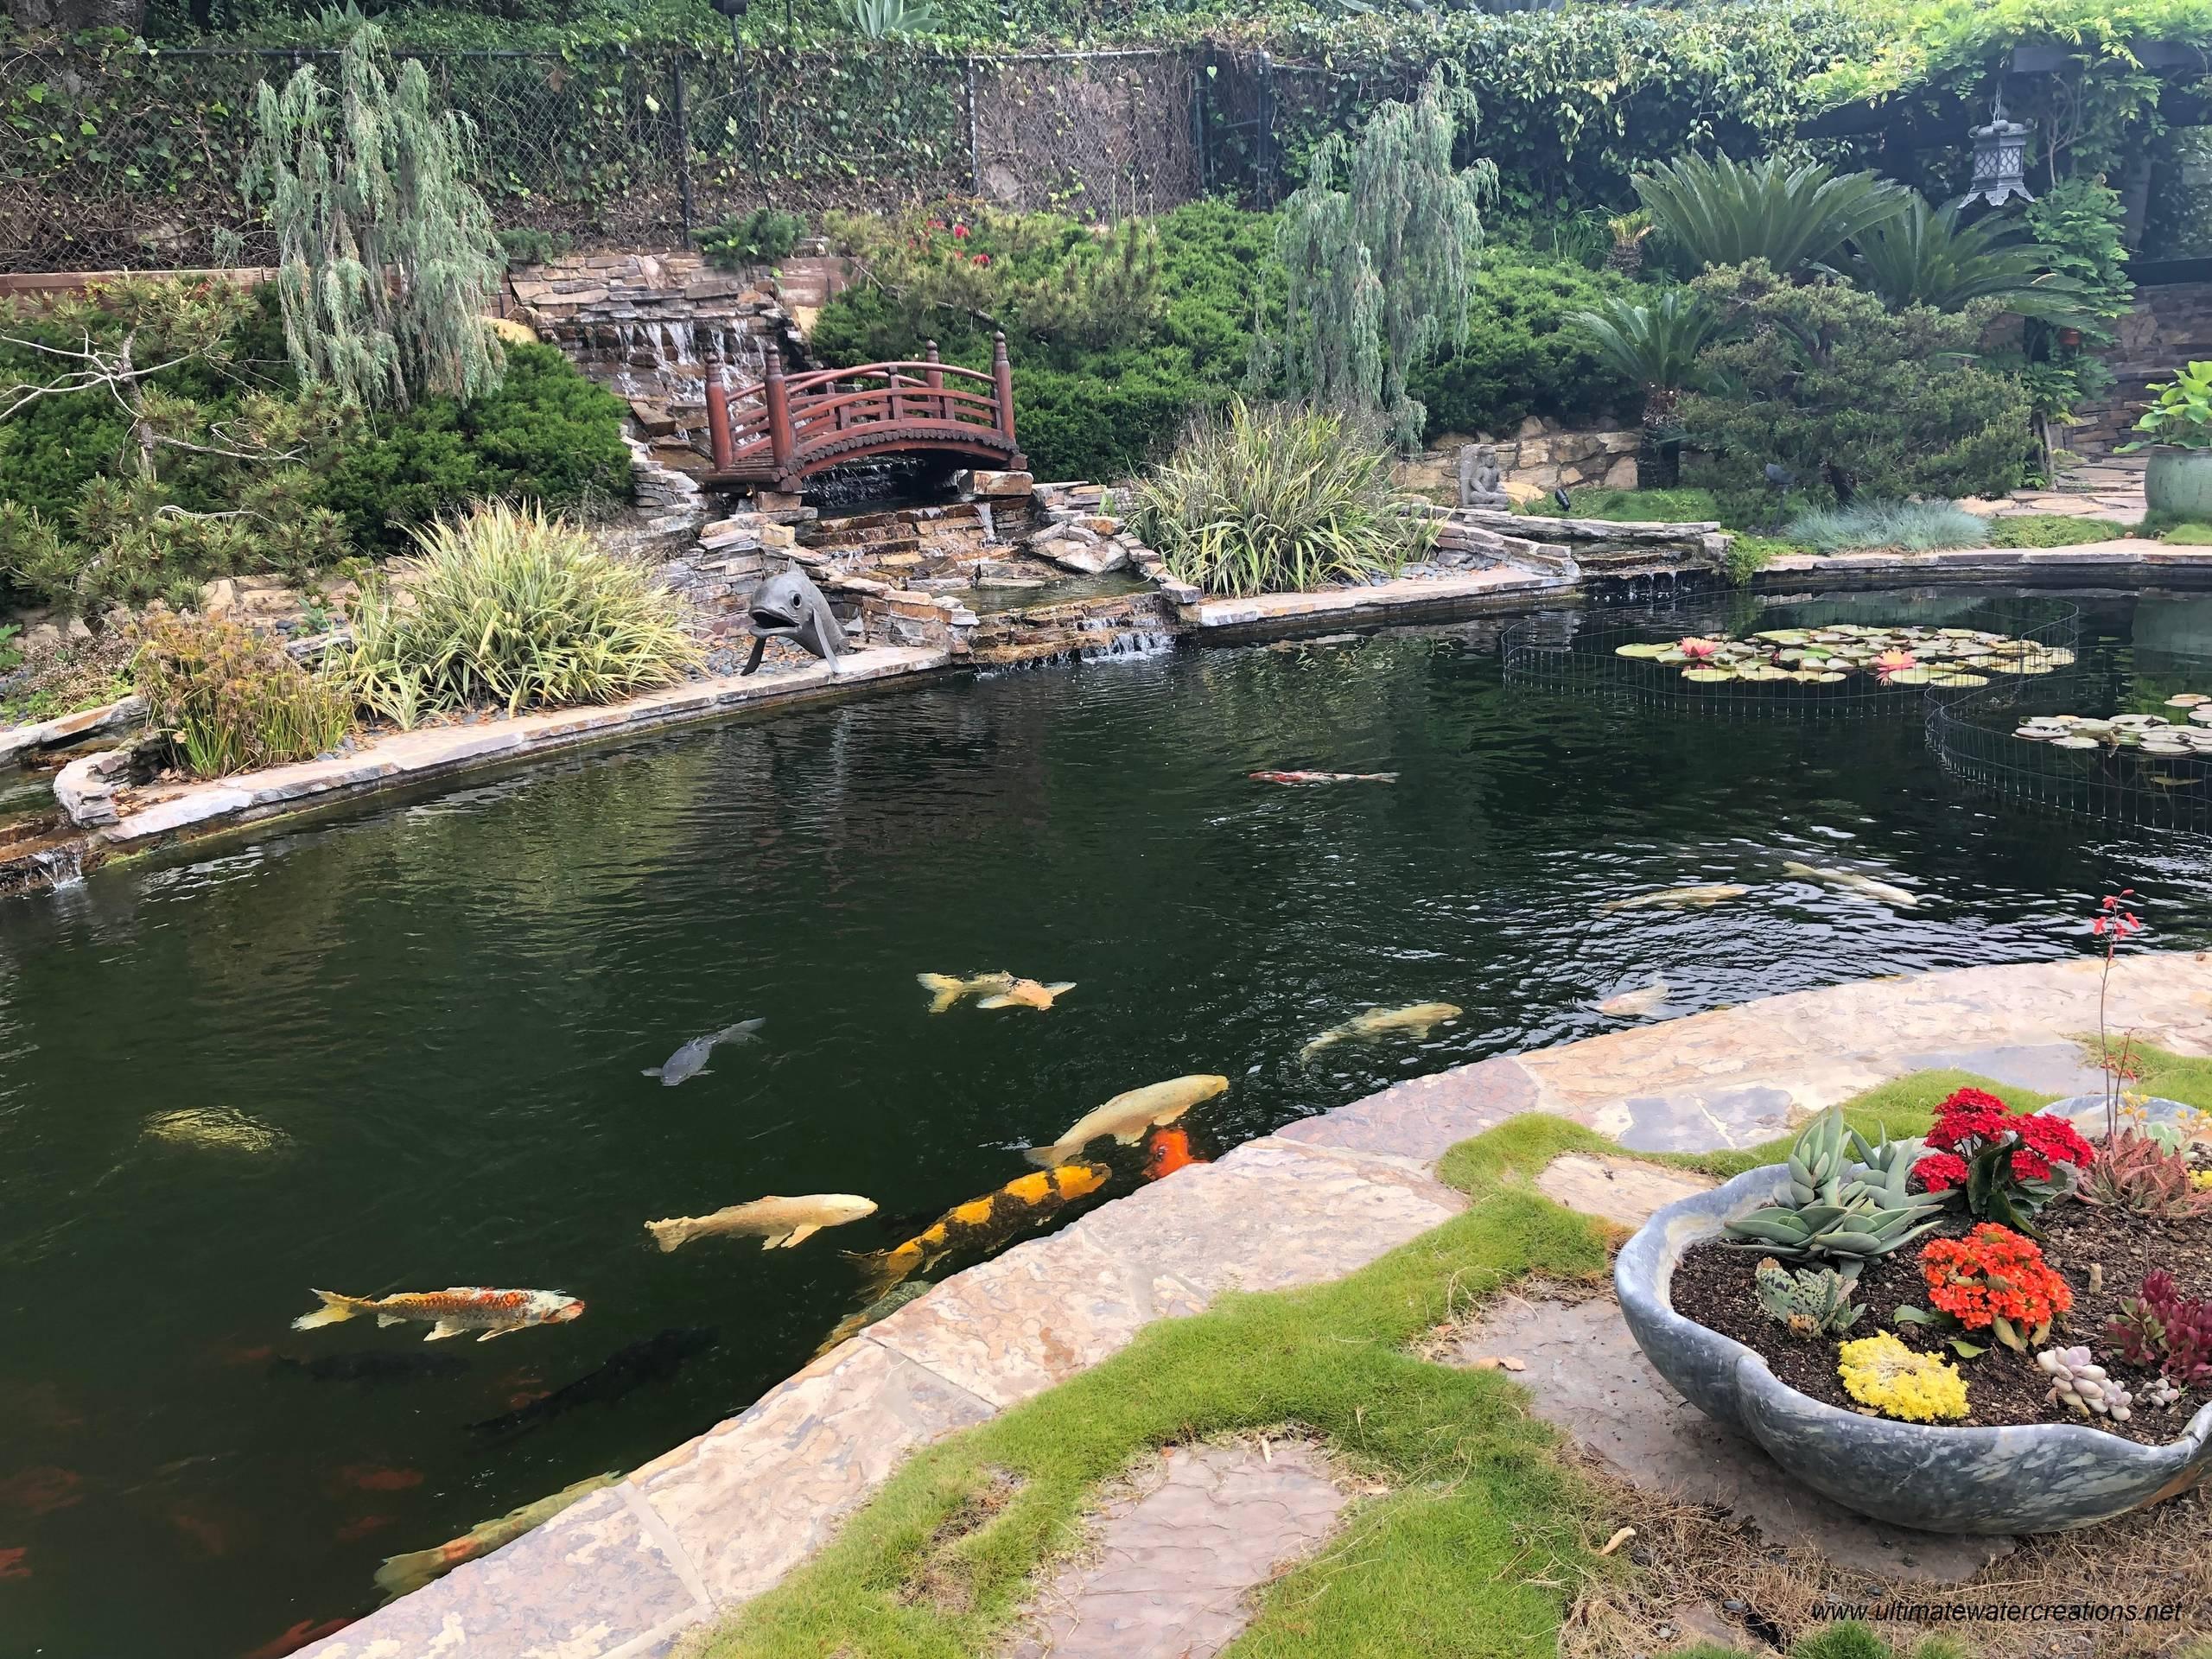 Bel Air - Naturalistic 20'x40' Koi Pond with Landscaping & Bridge